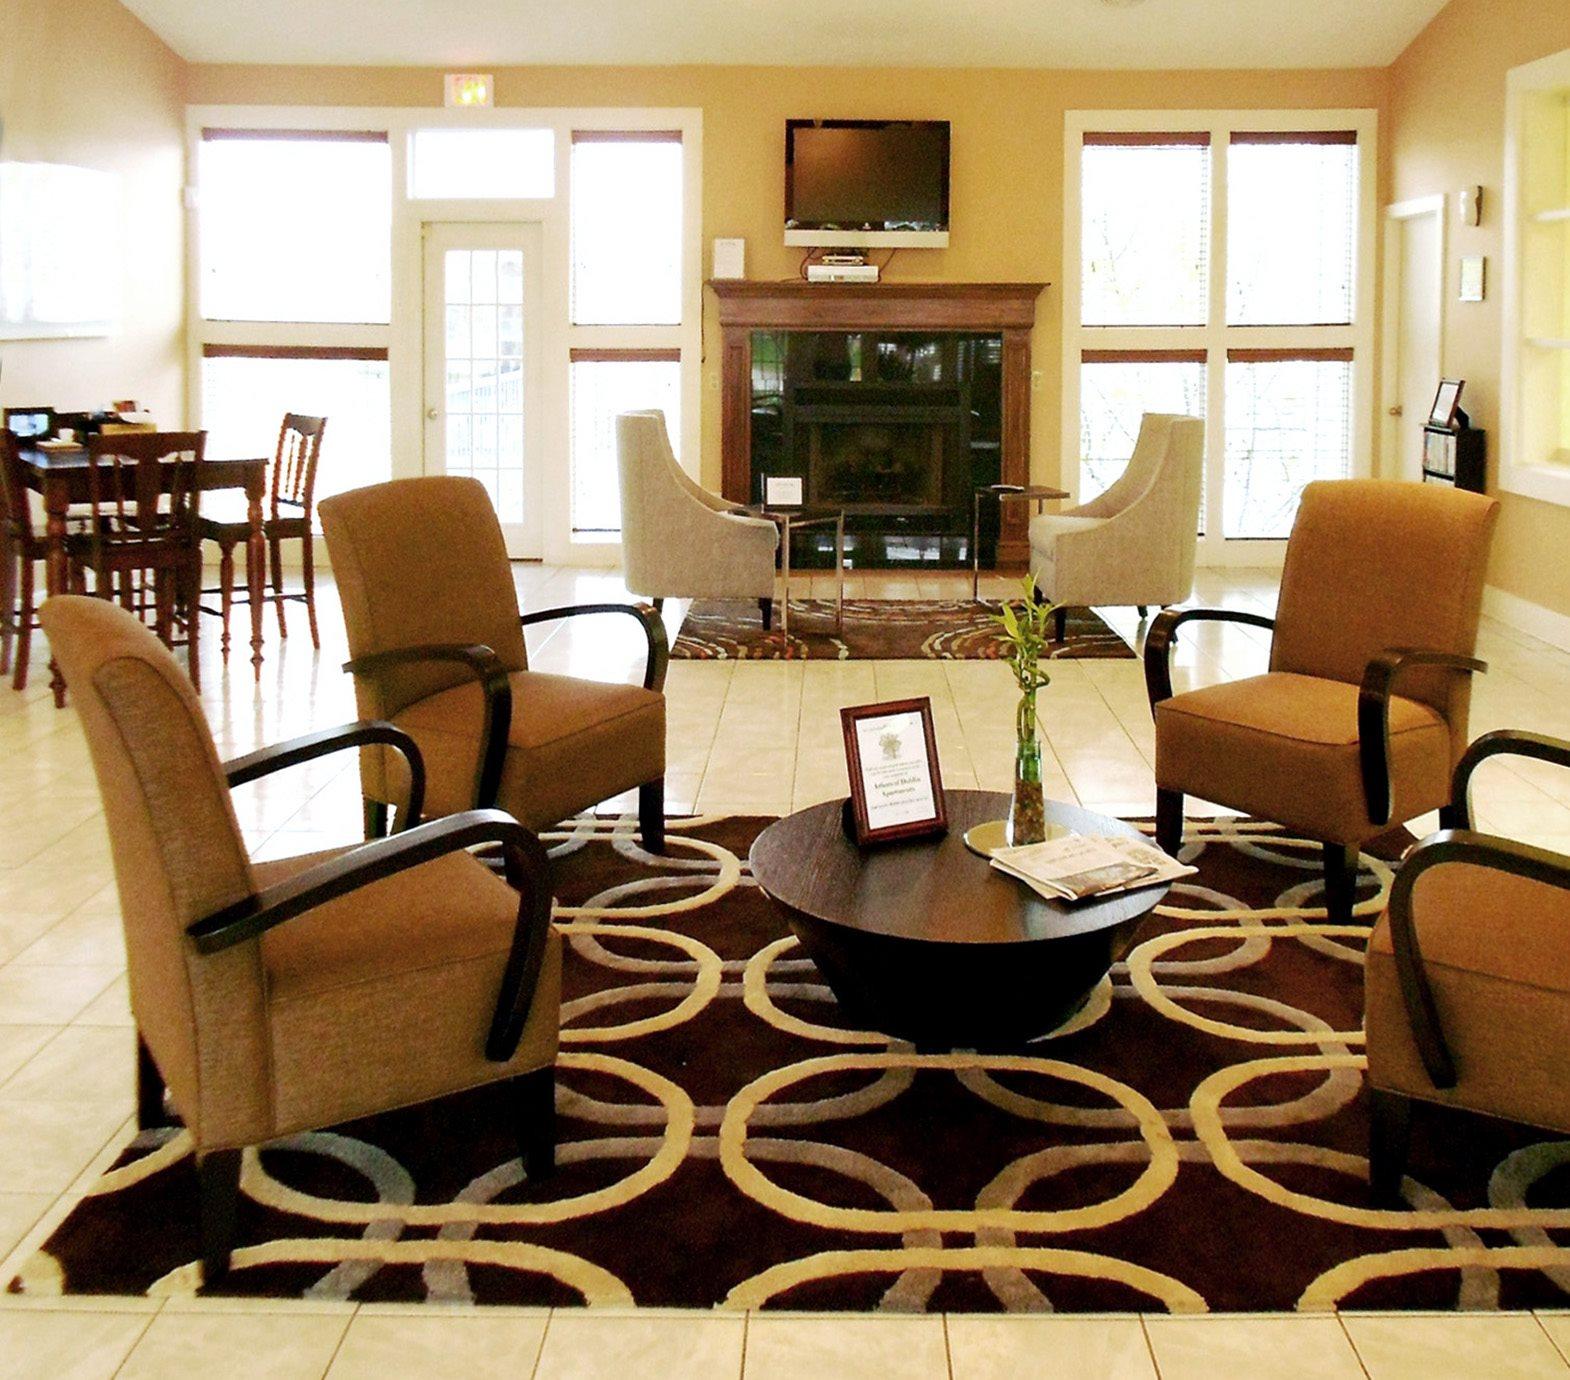 Arbors of dublin apartments in dublin oh 2 bedroom apartments in dublin ohio